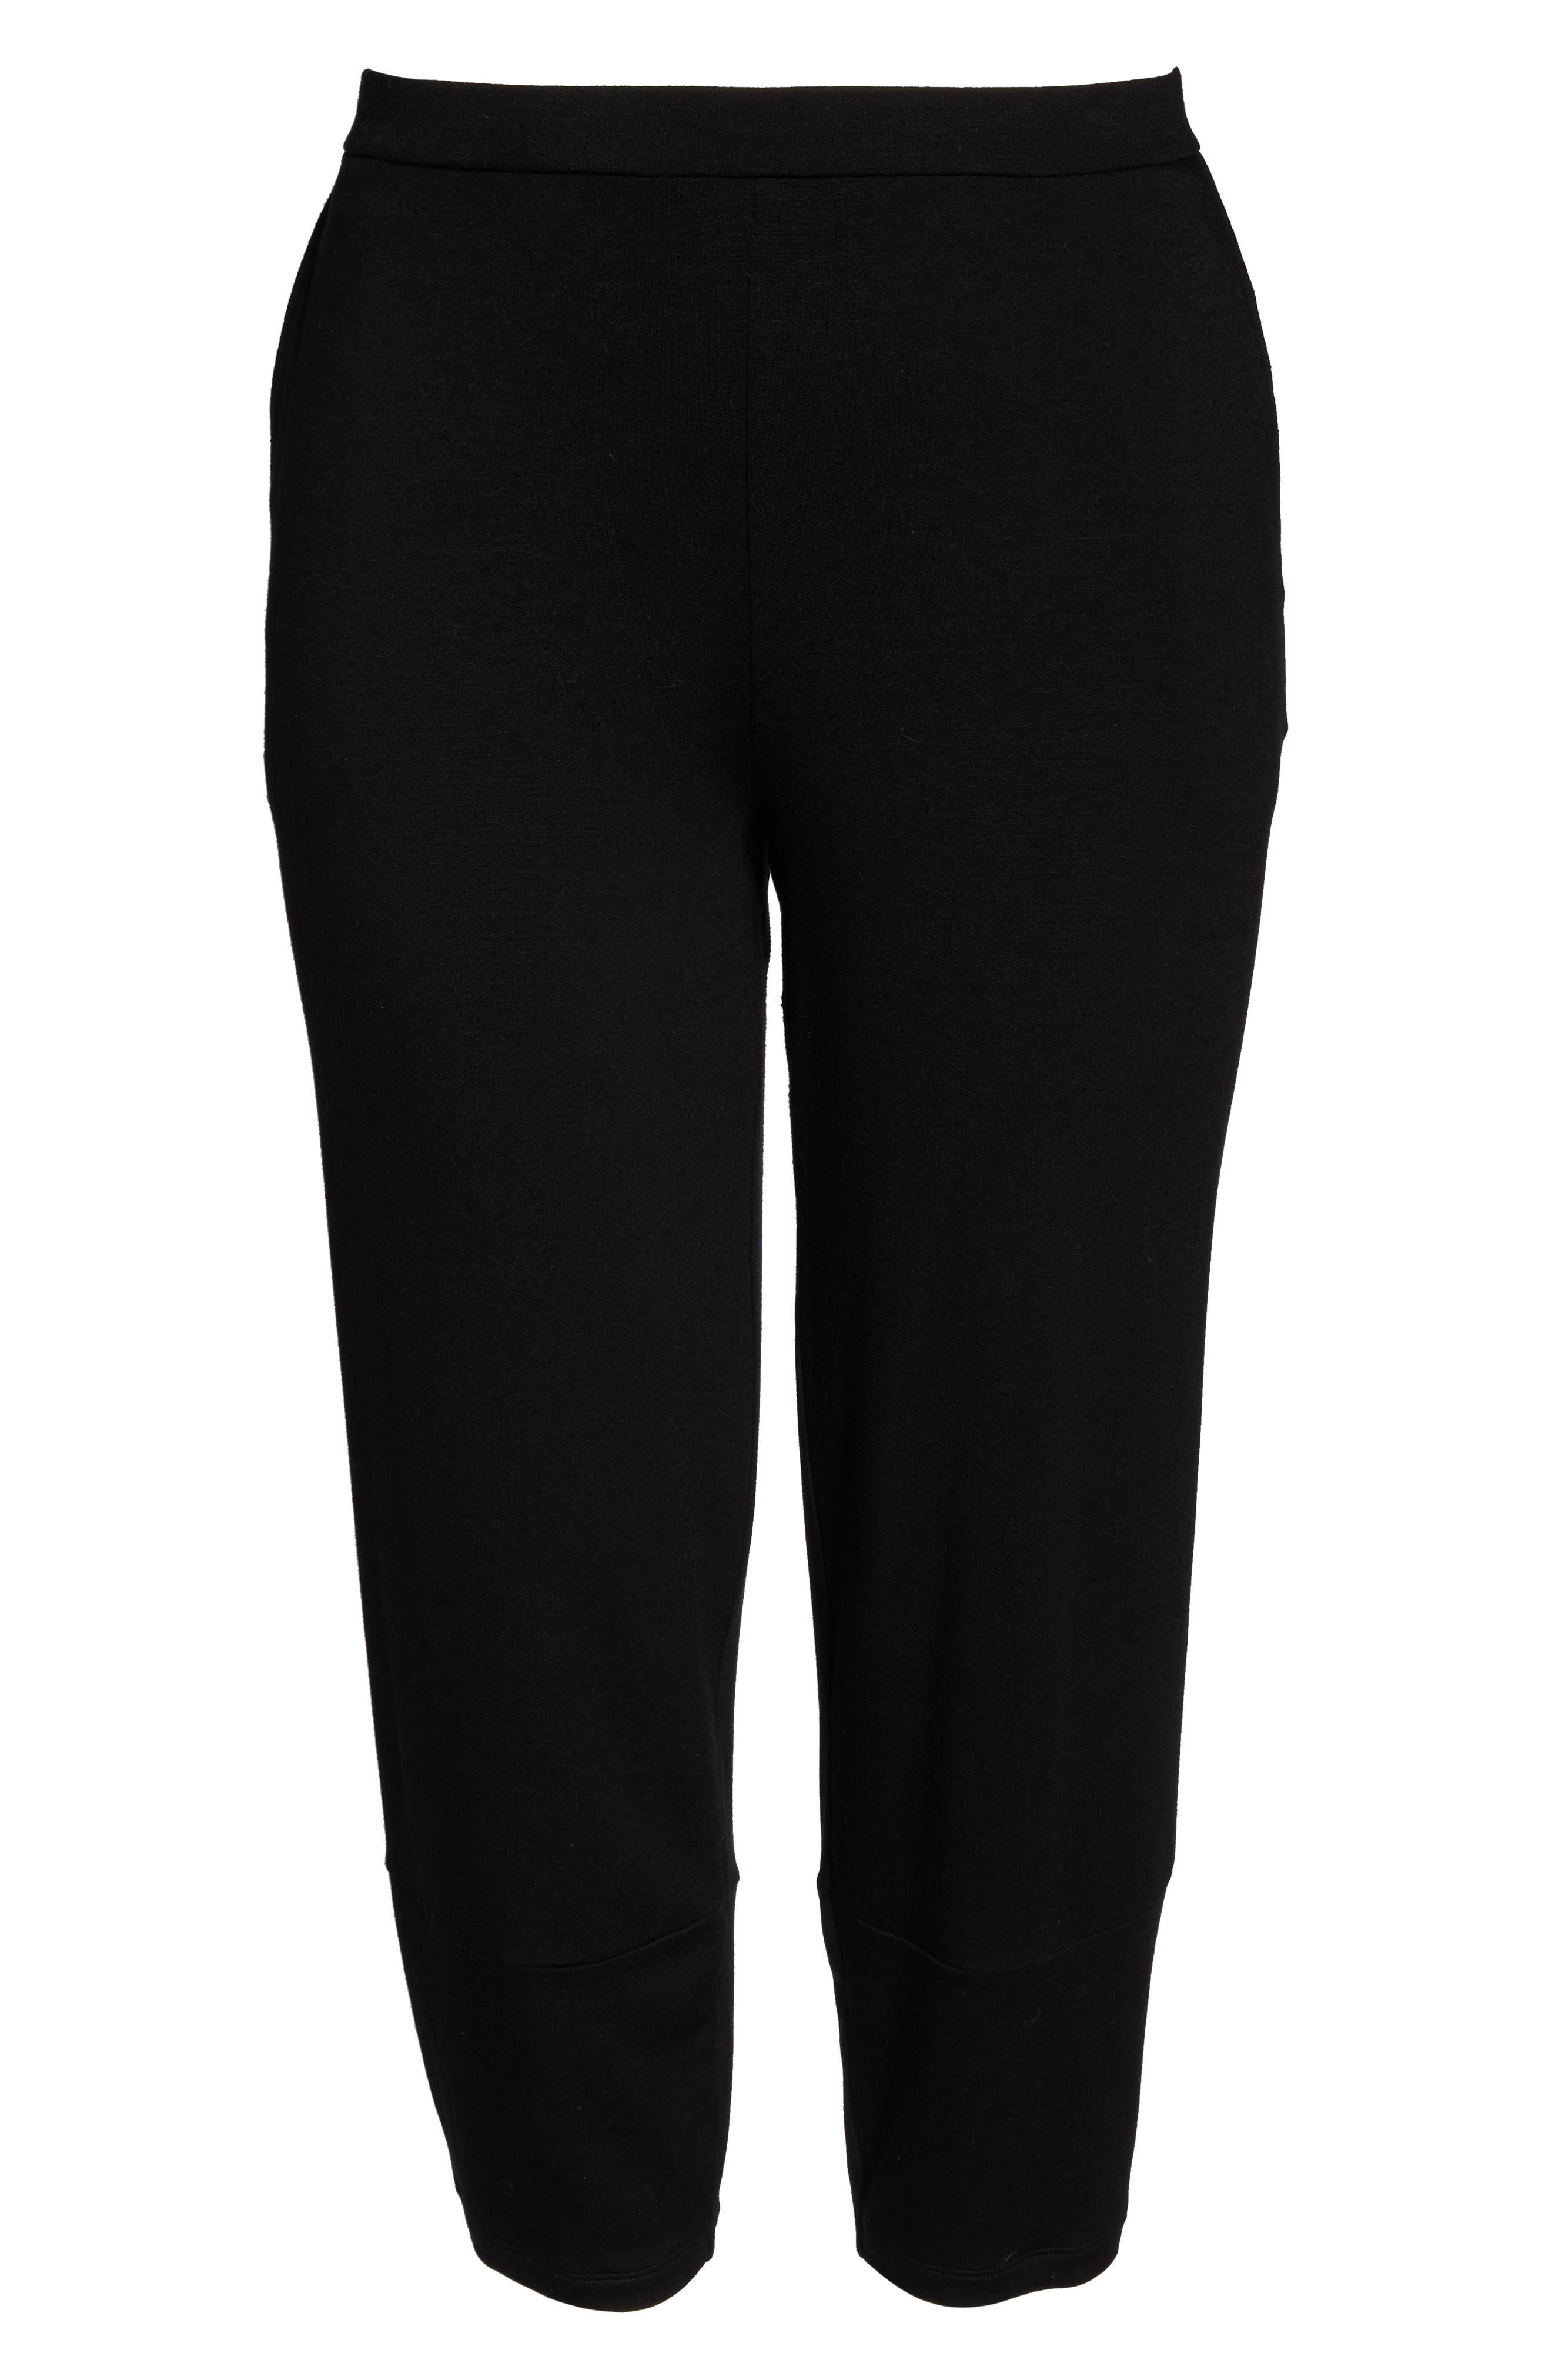 Terry Lantern High Rise Ankle Pants,                             Alternate thumbnail 11, color,                             BLACK